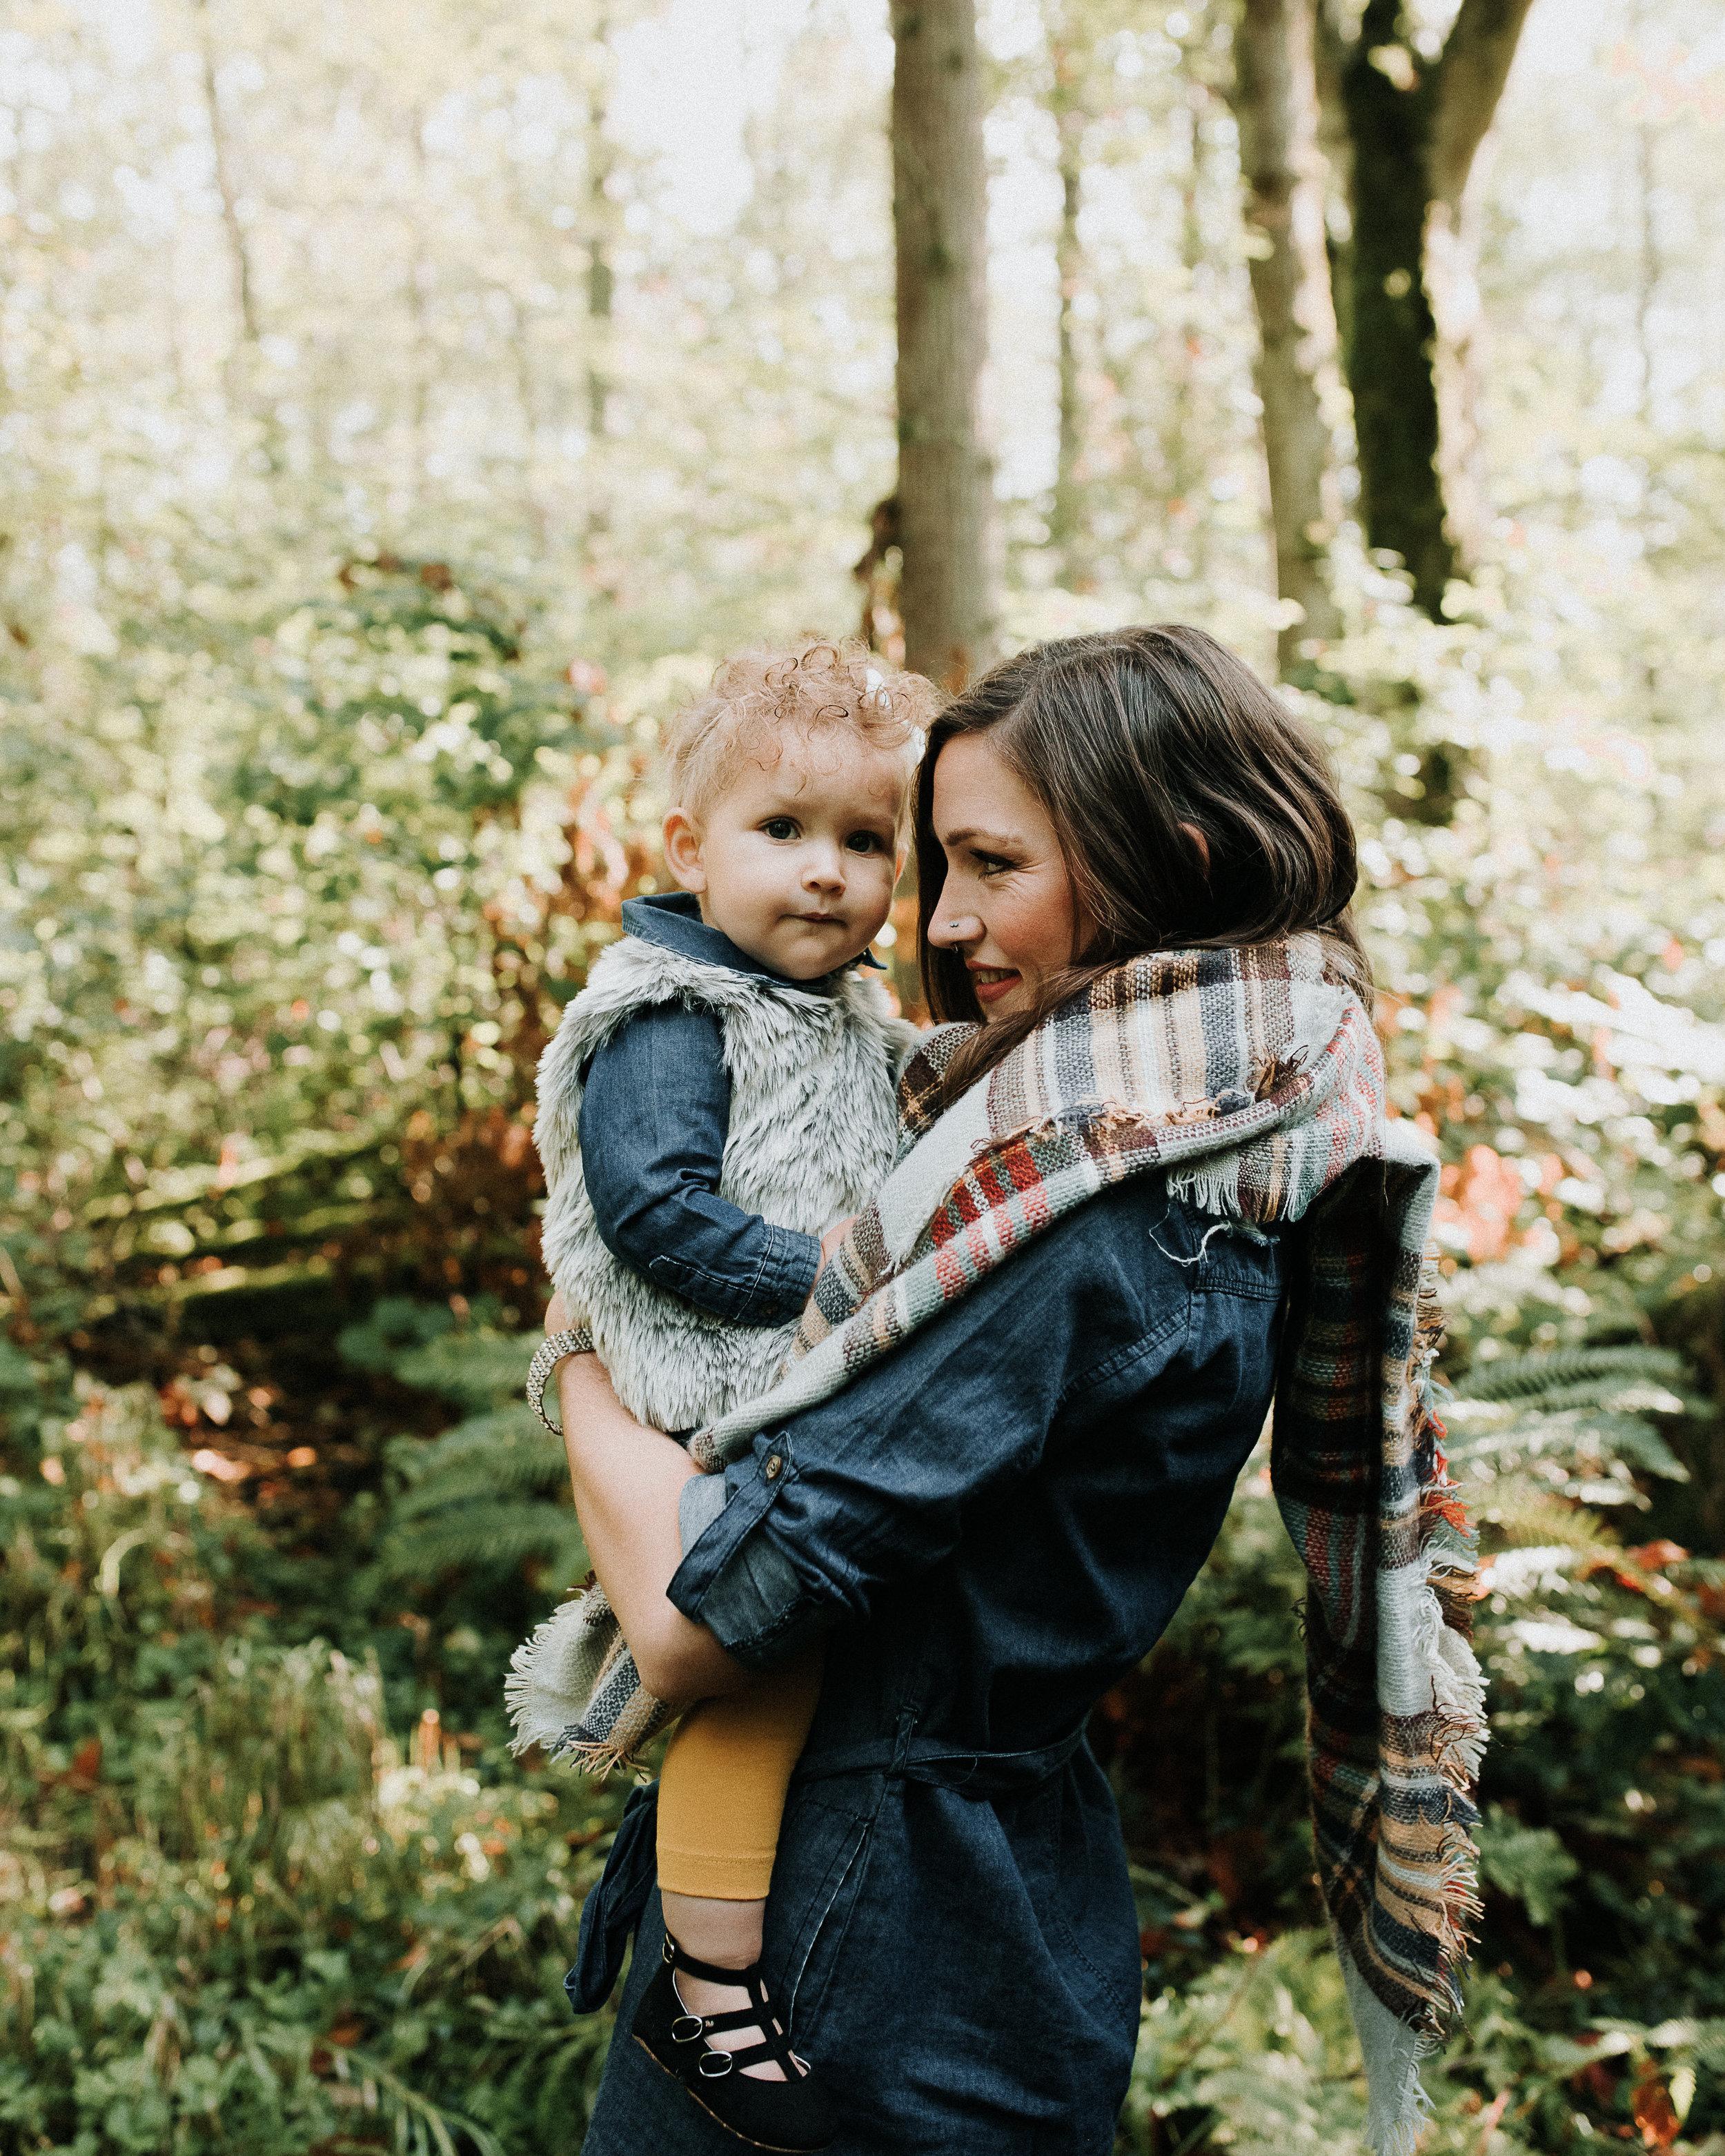 Family-Photographer-Bellingham-WA-Brianne-Bell-Photography-(Miller)34.jpg